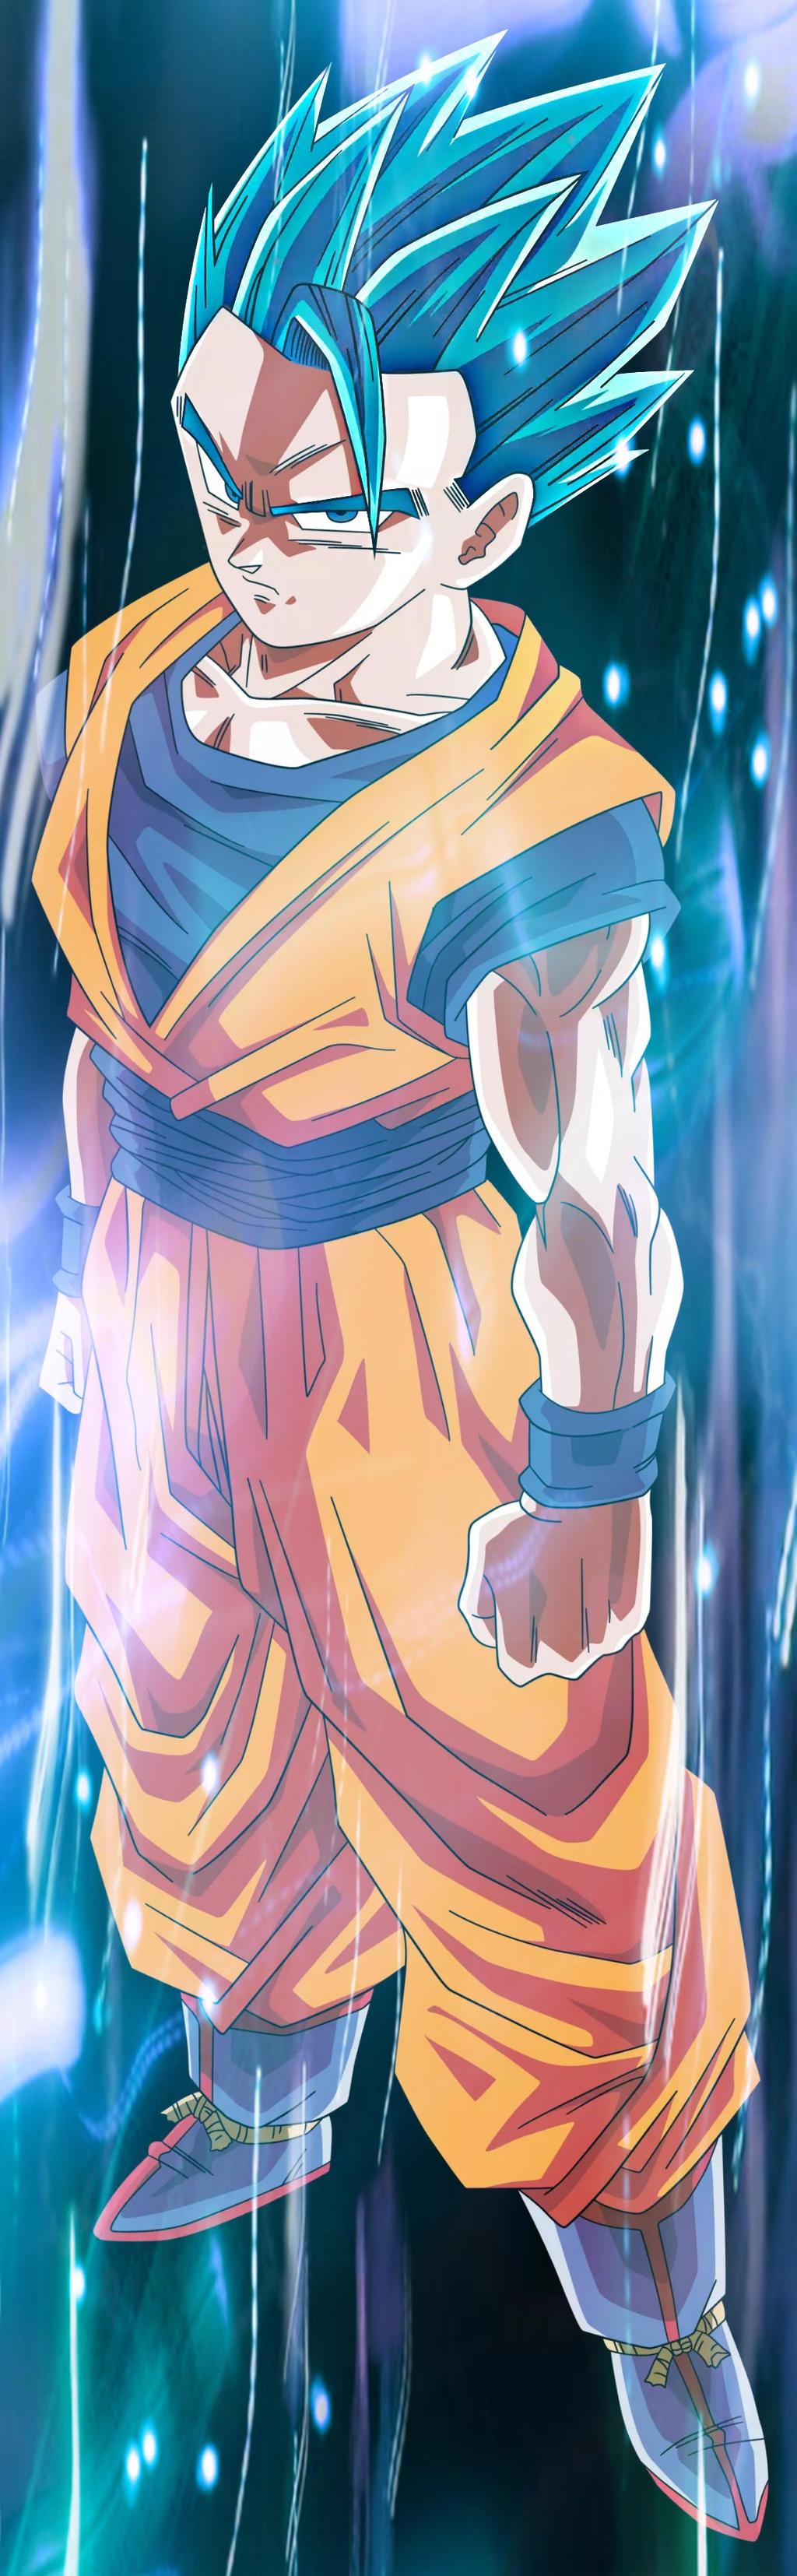 The Goku vs teen gohan